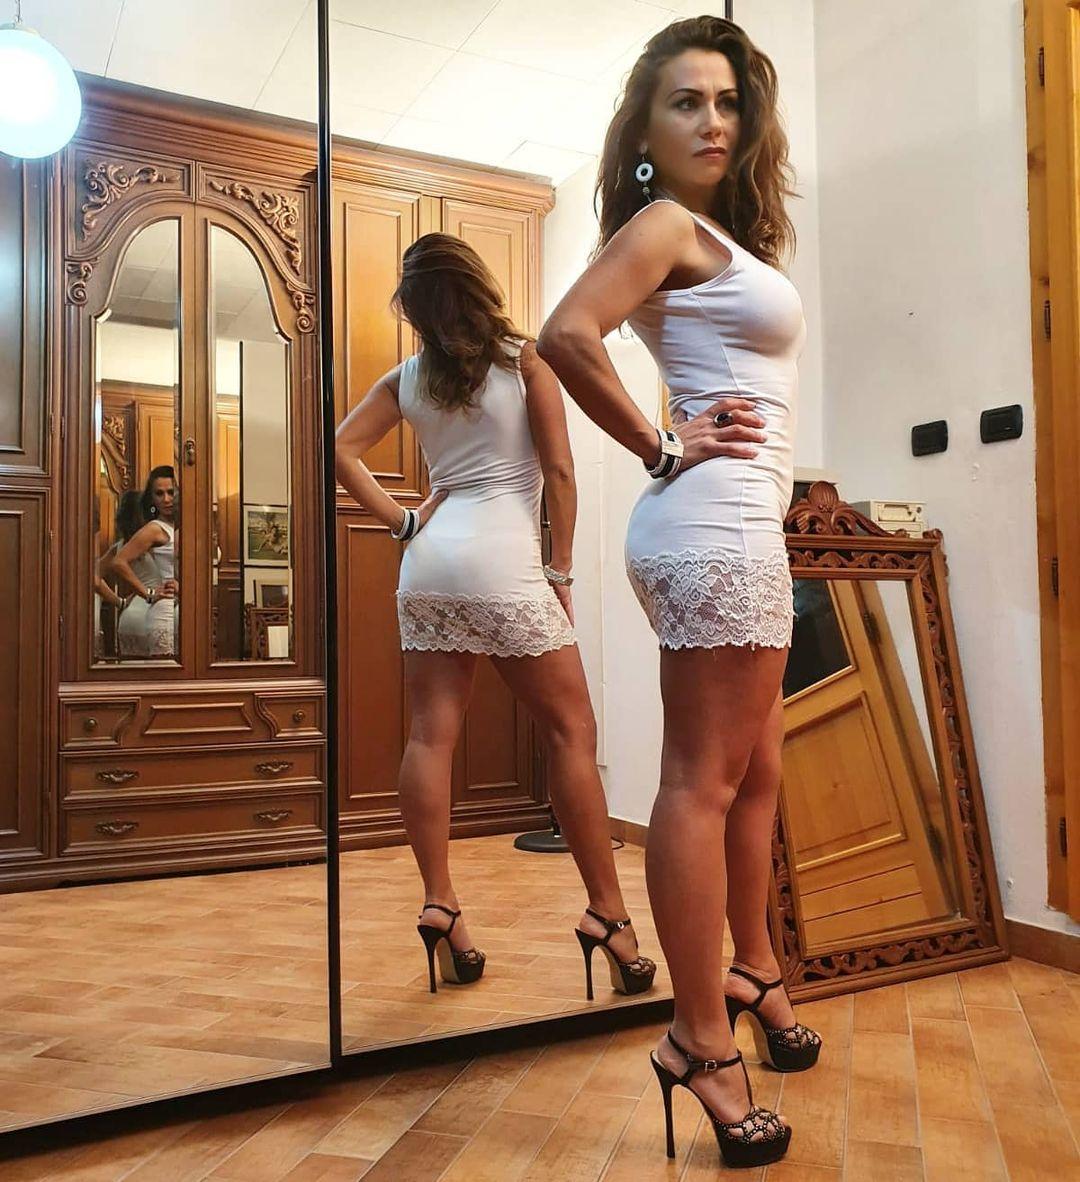 Francesca-Nerina-Wallpapers-Insta-Fit-Bio-1